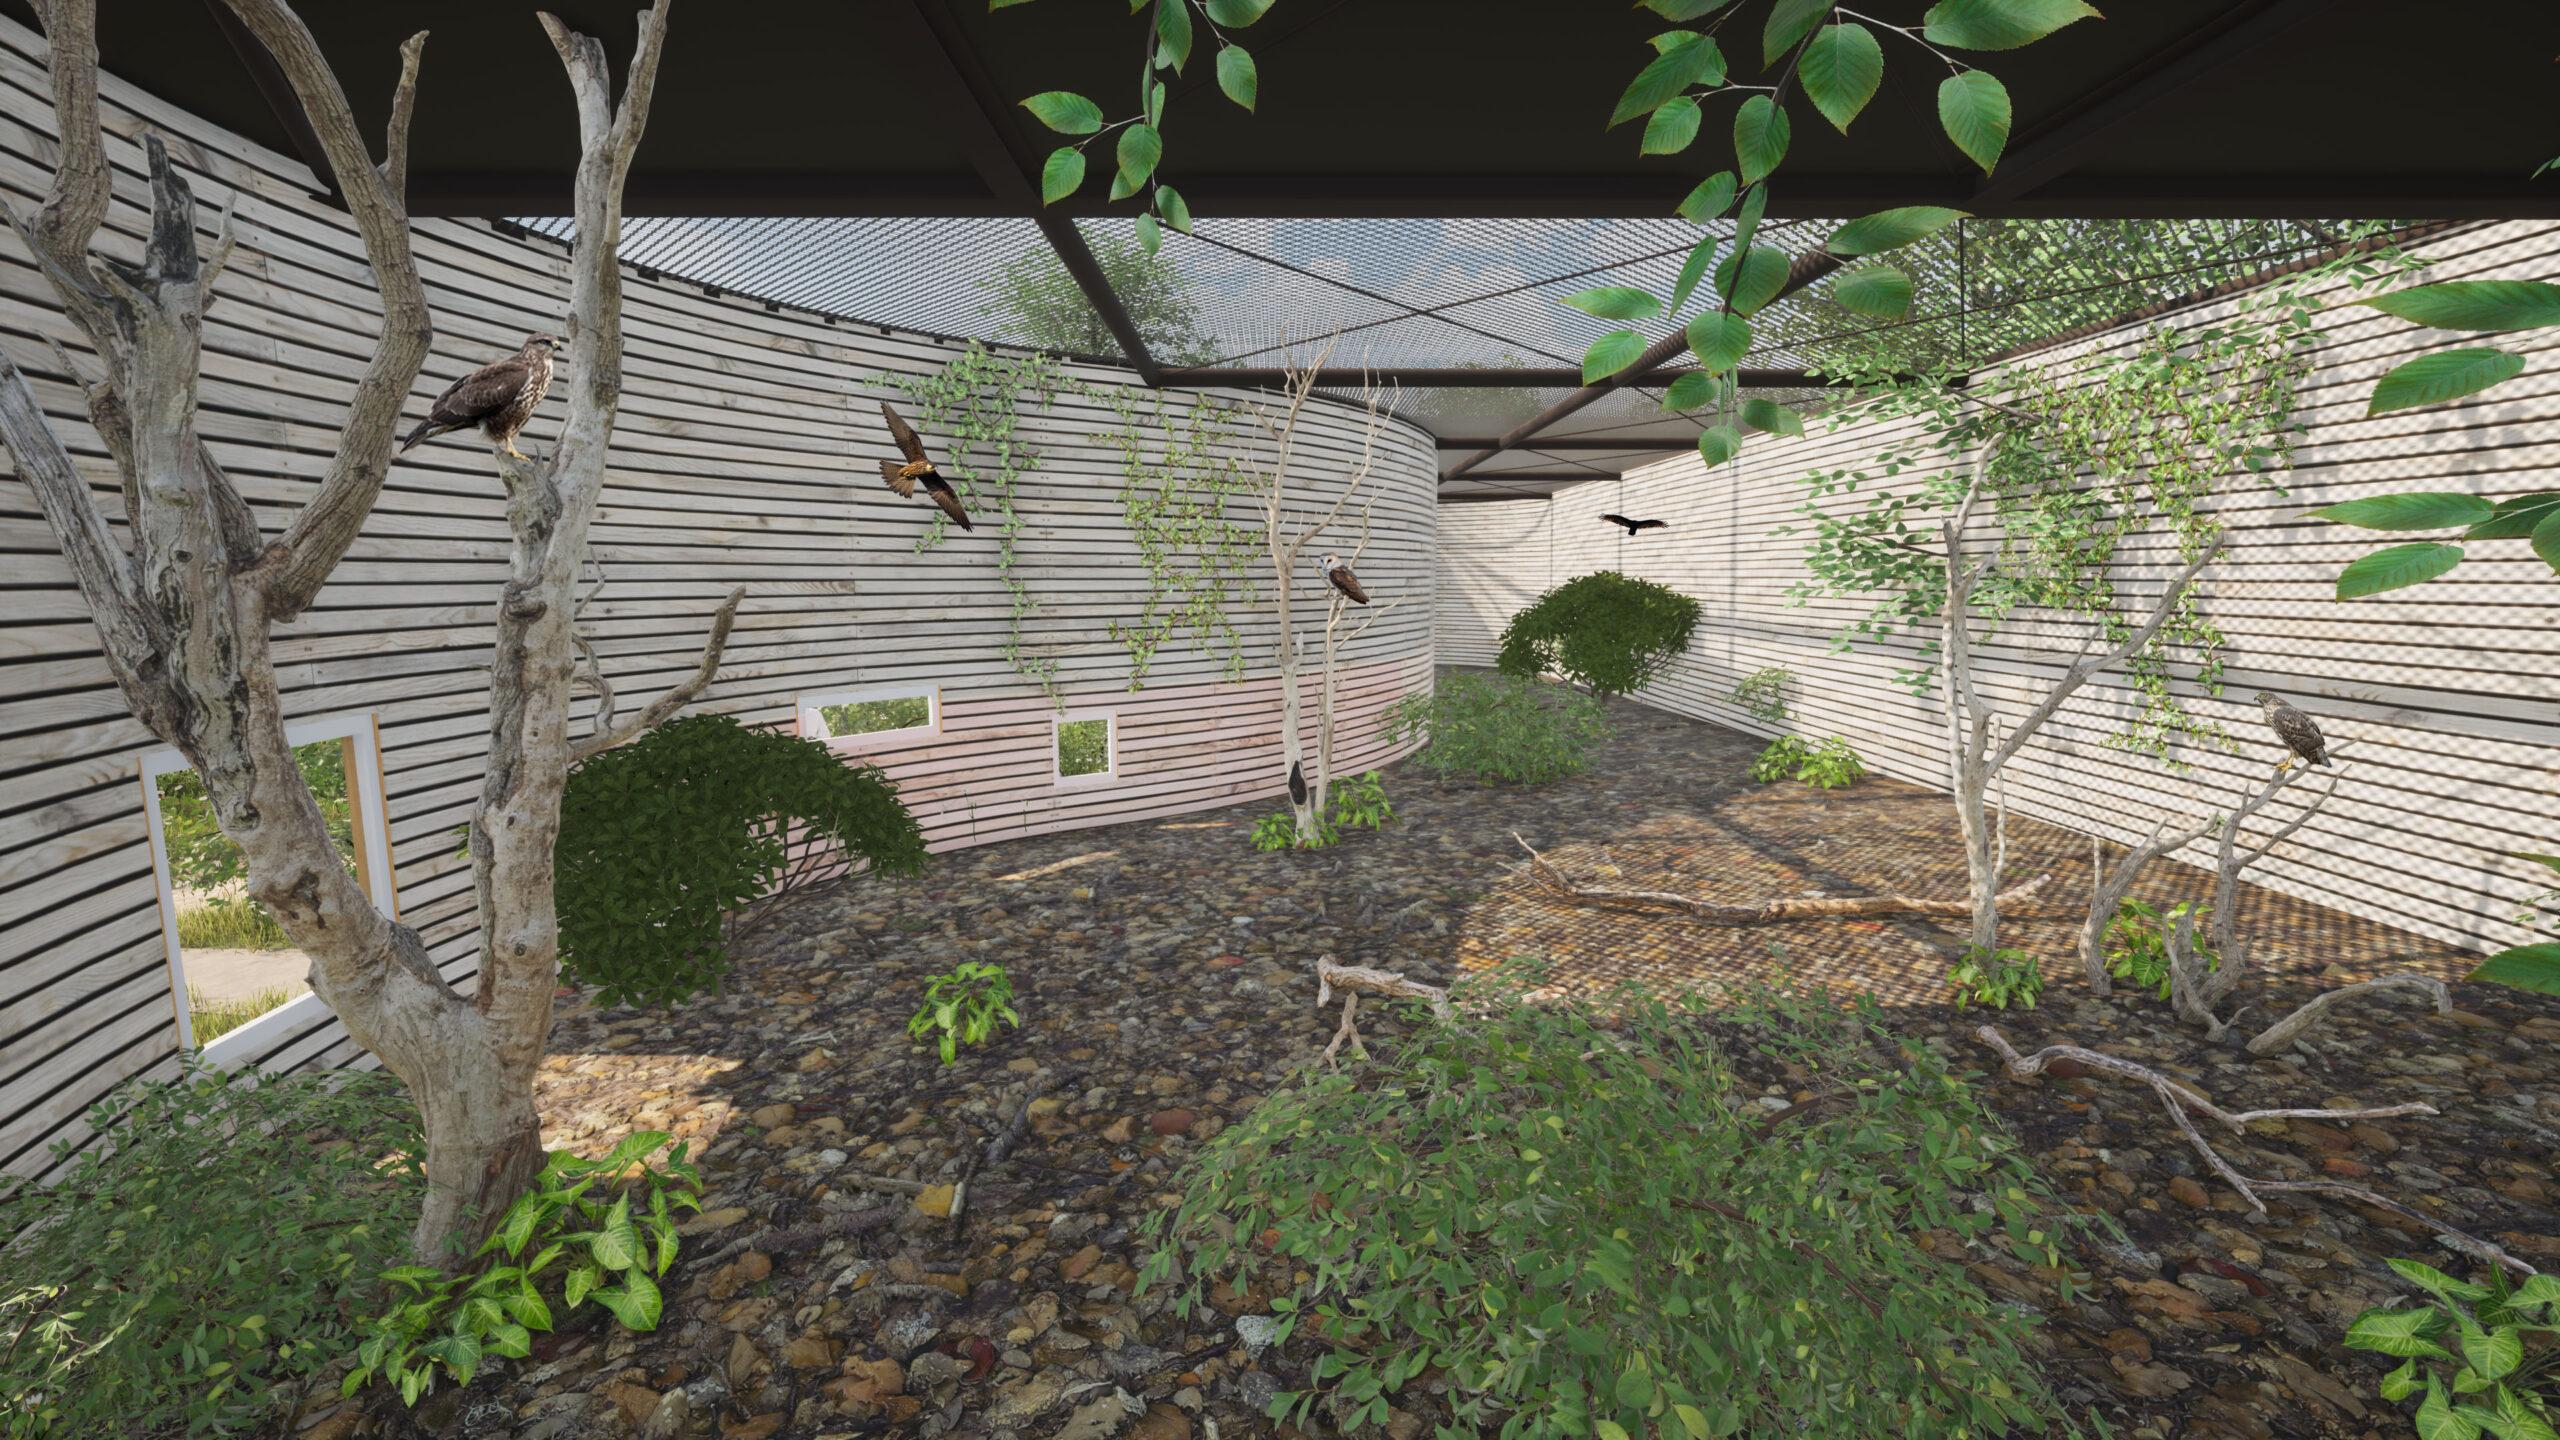 Orga Architect Bouw Avolare 018 Roofvogelverblijf Binnen